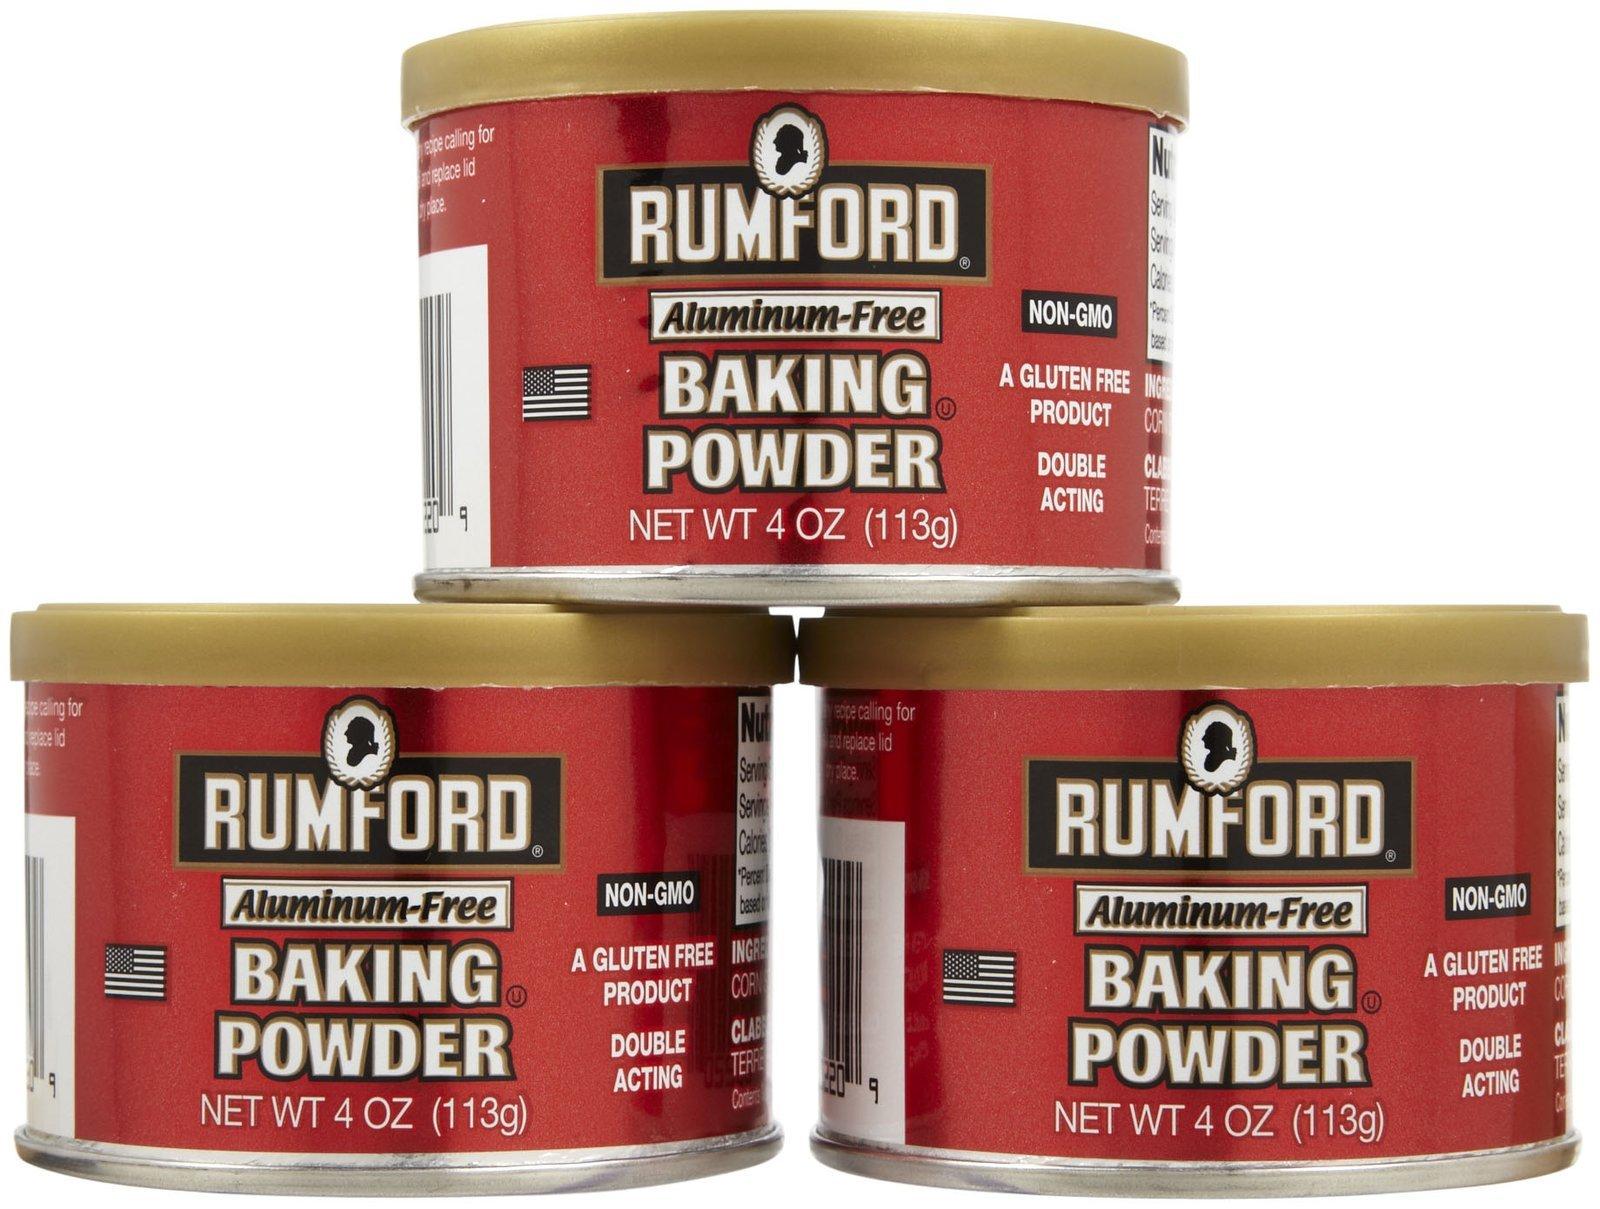 Rumford Gluten Free Baking Powder - 4 oz - 3 pk